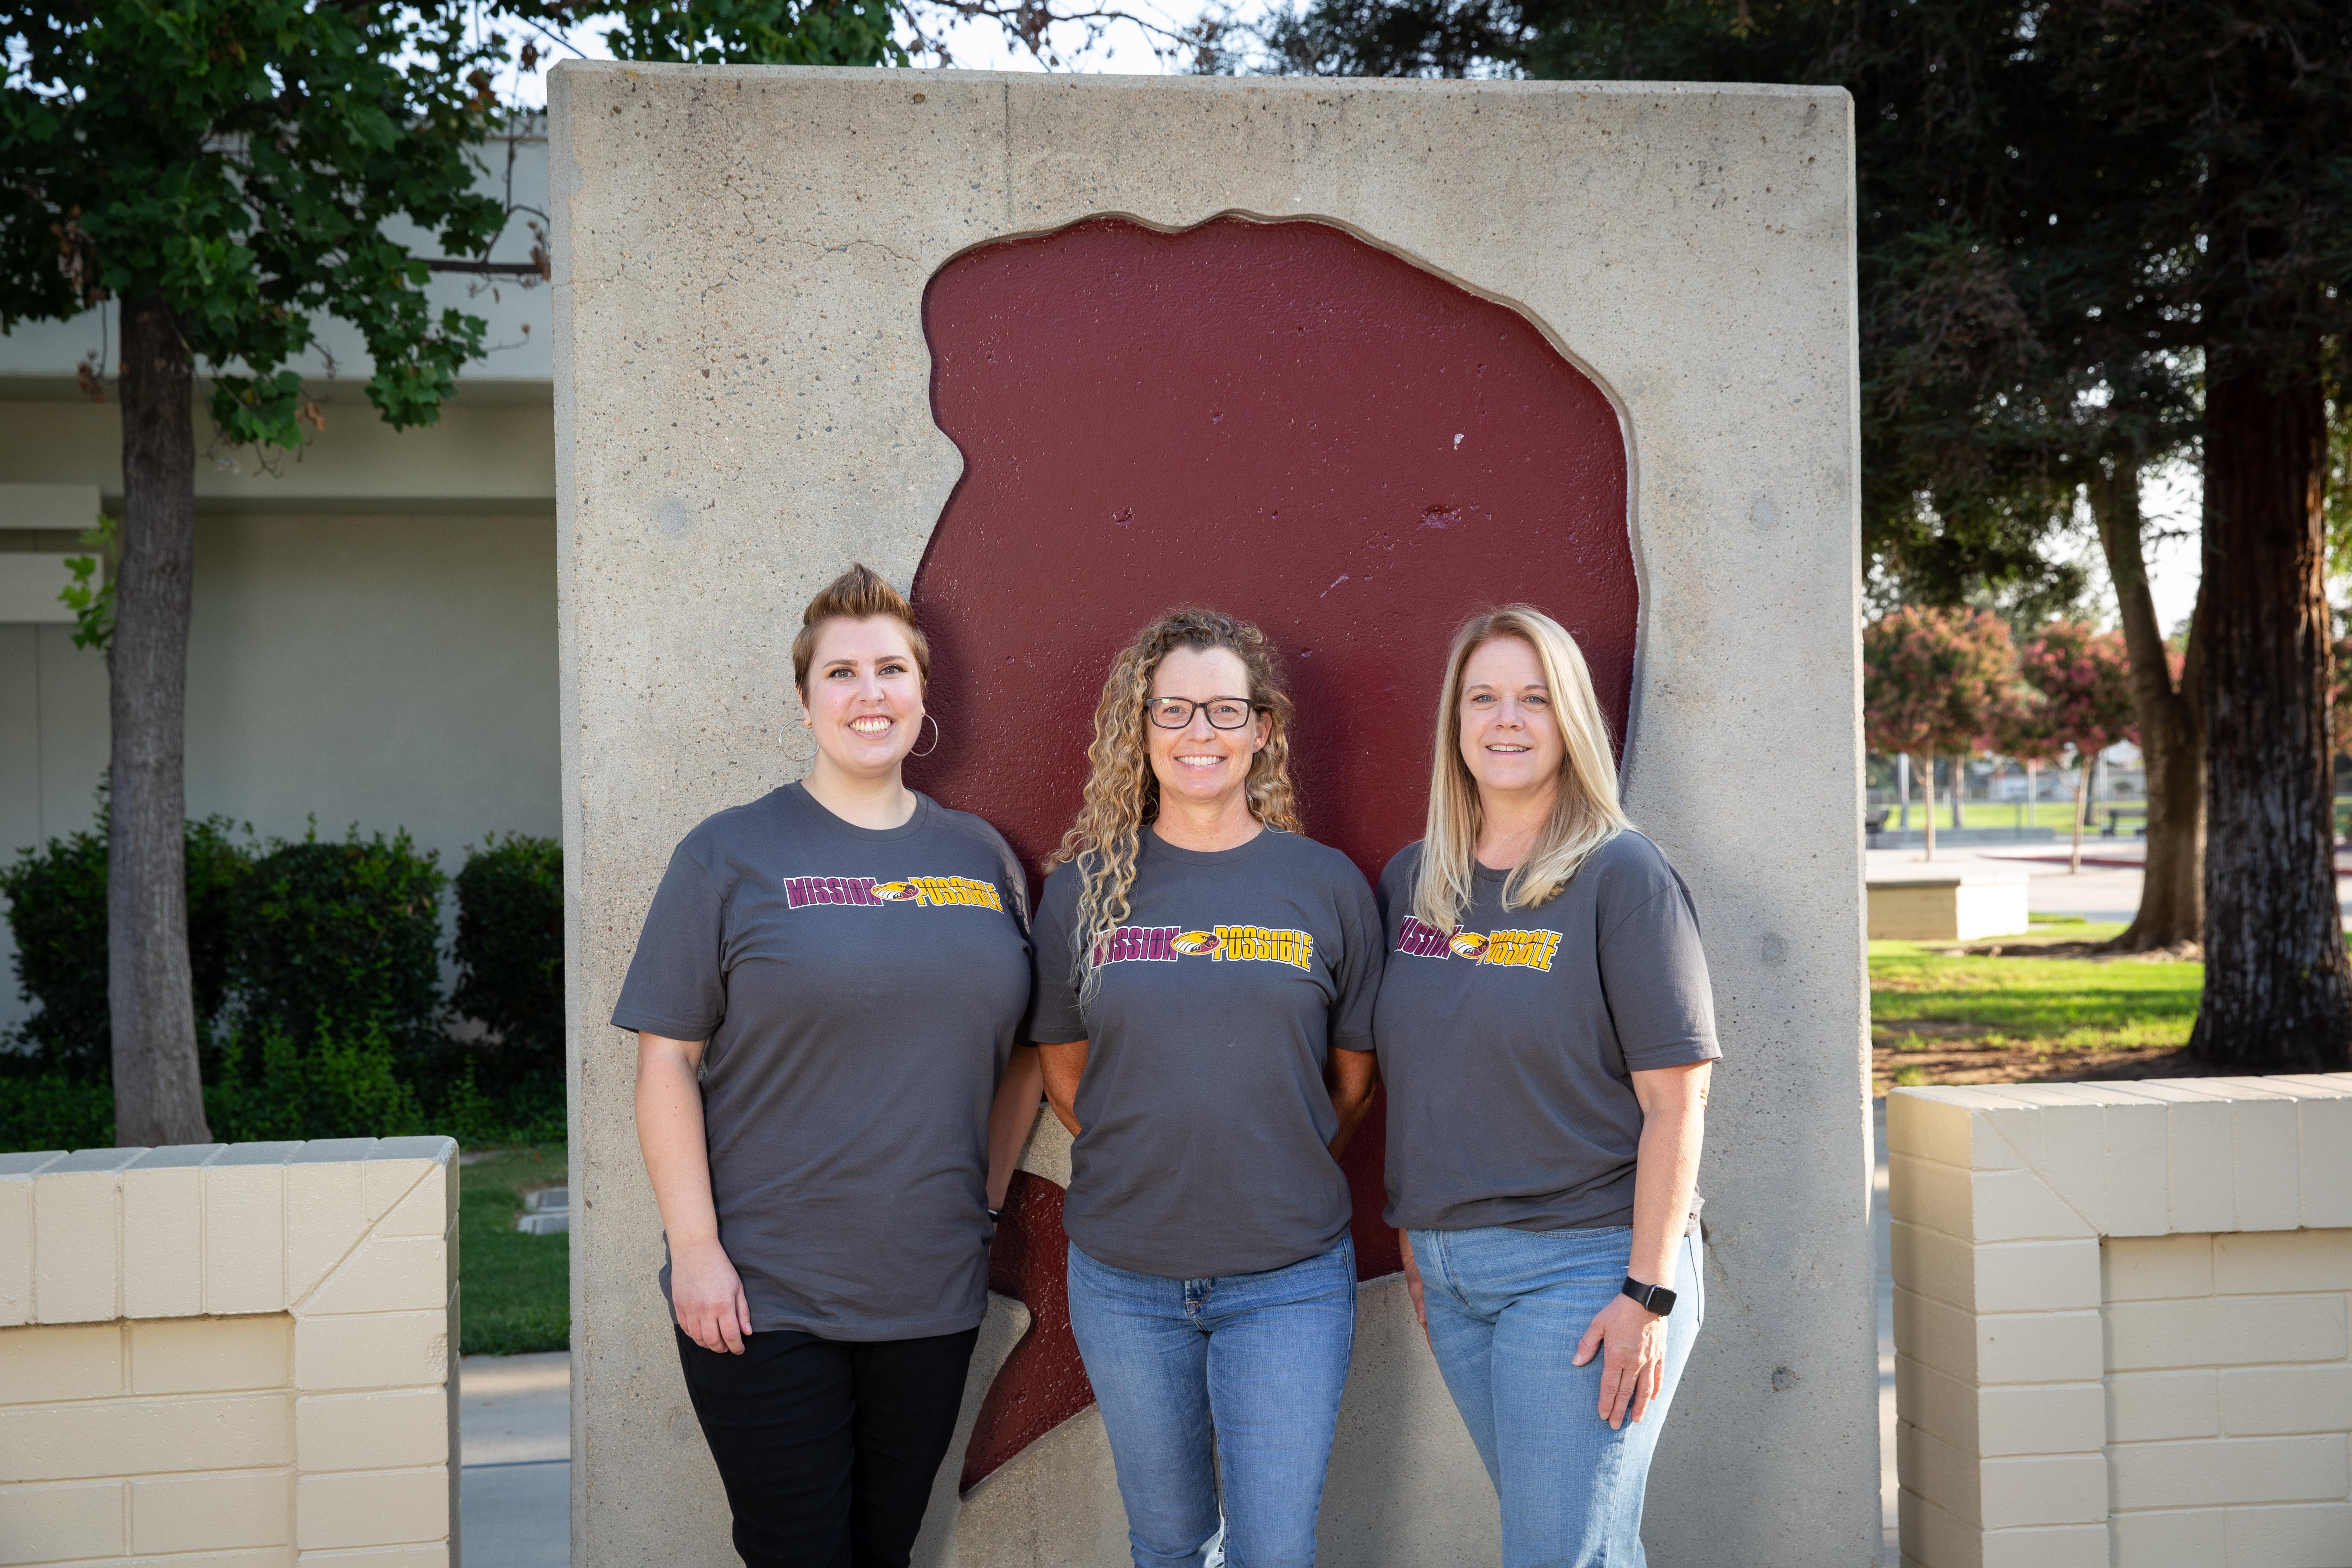 Fifth grade teachers Amanda Kehler, Elyssa McCoy, and Laura Mayer